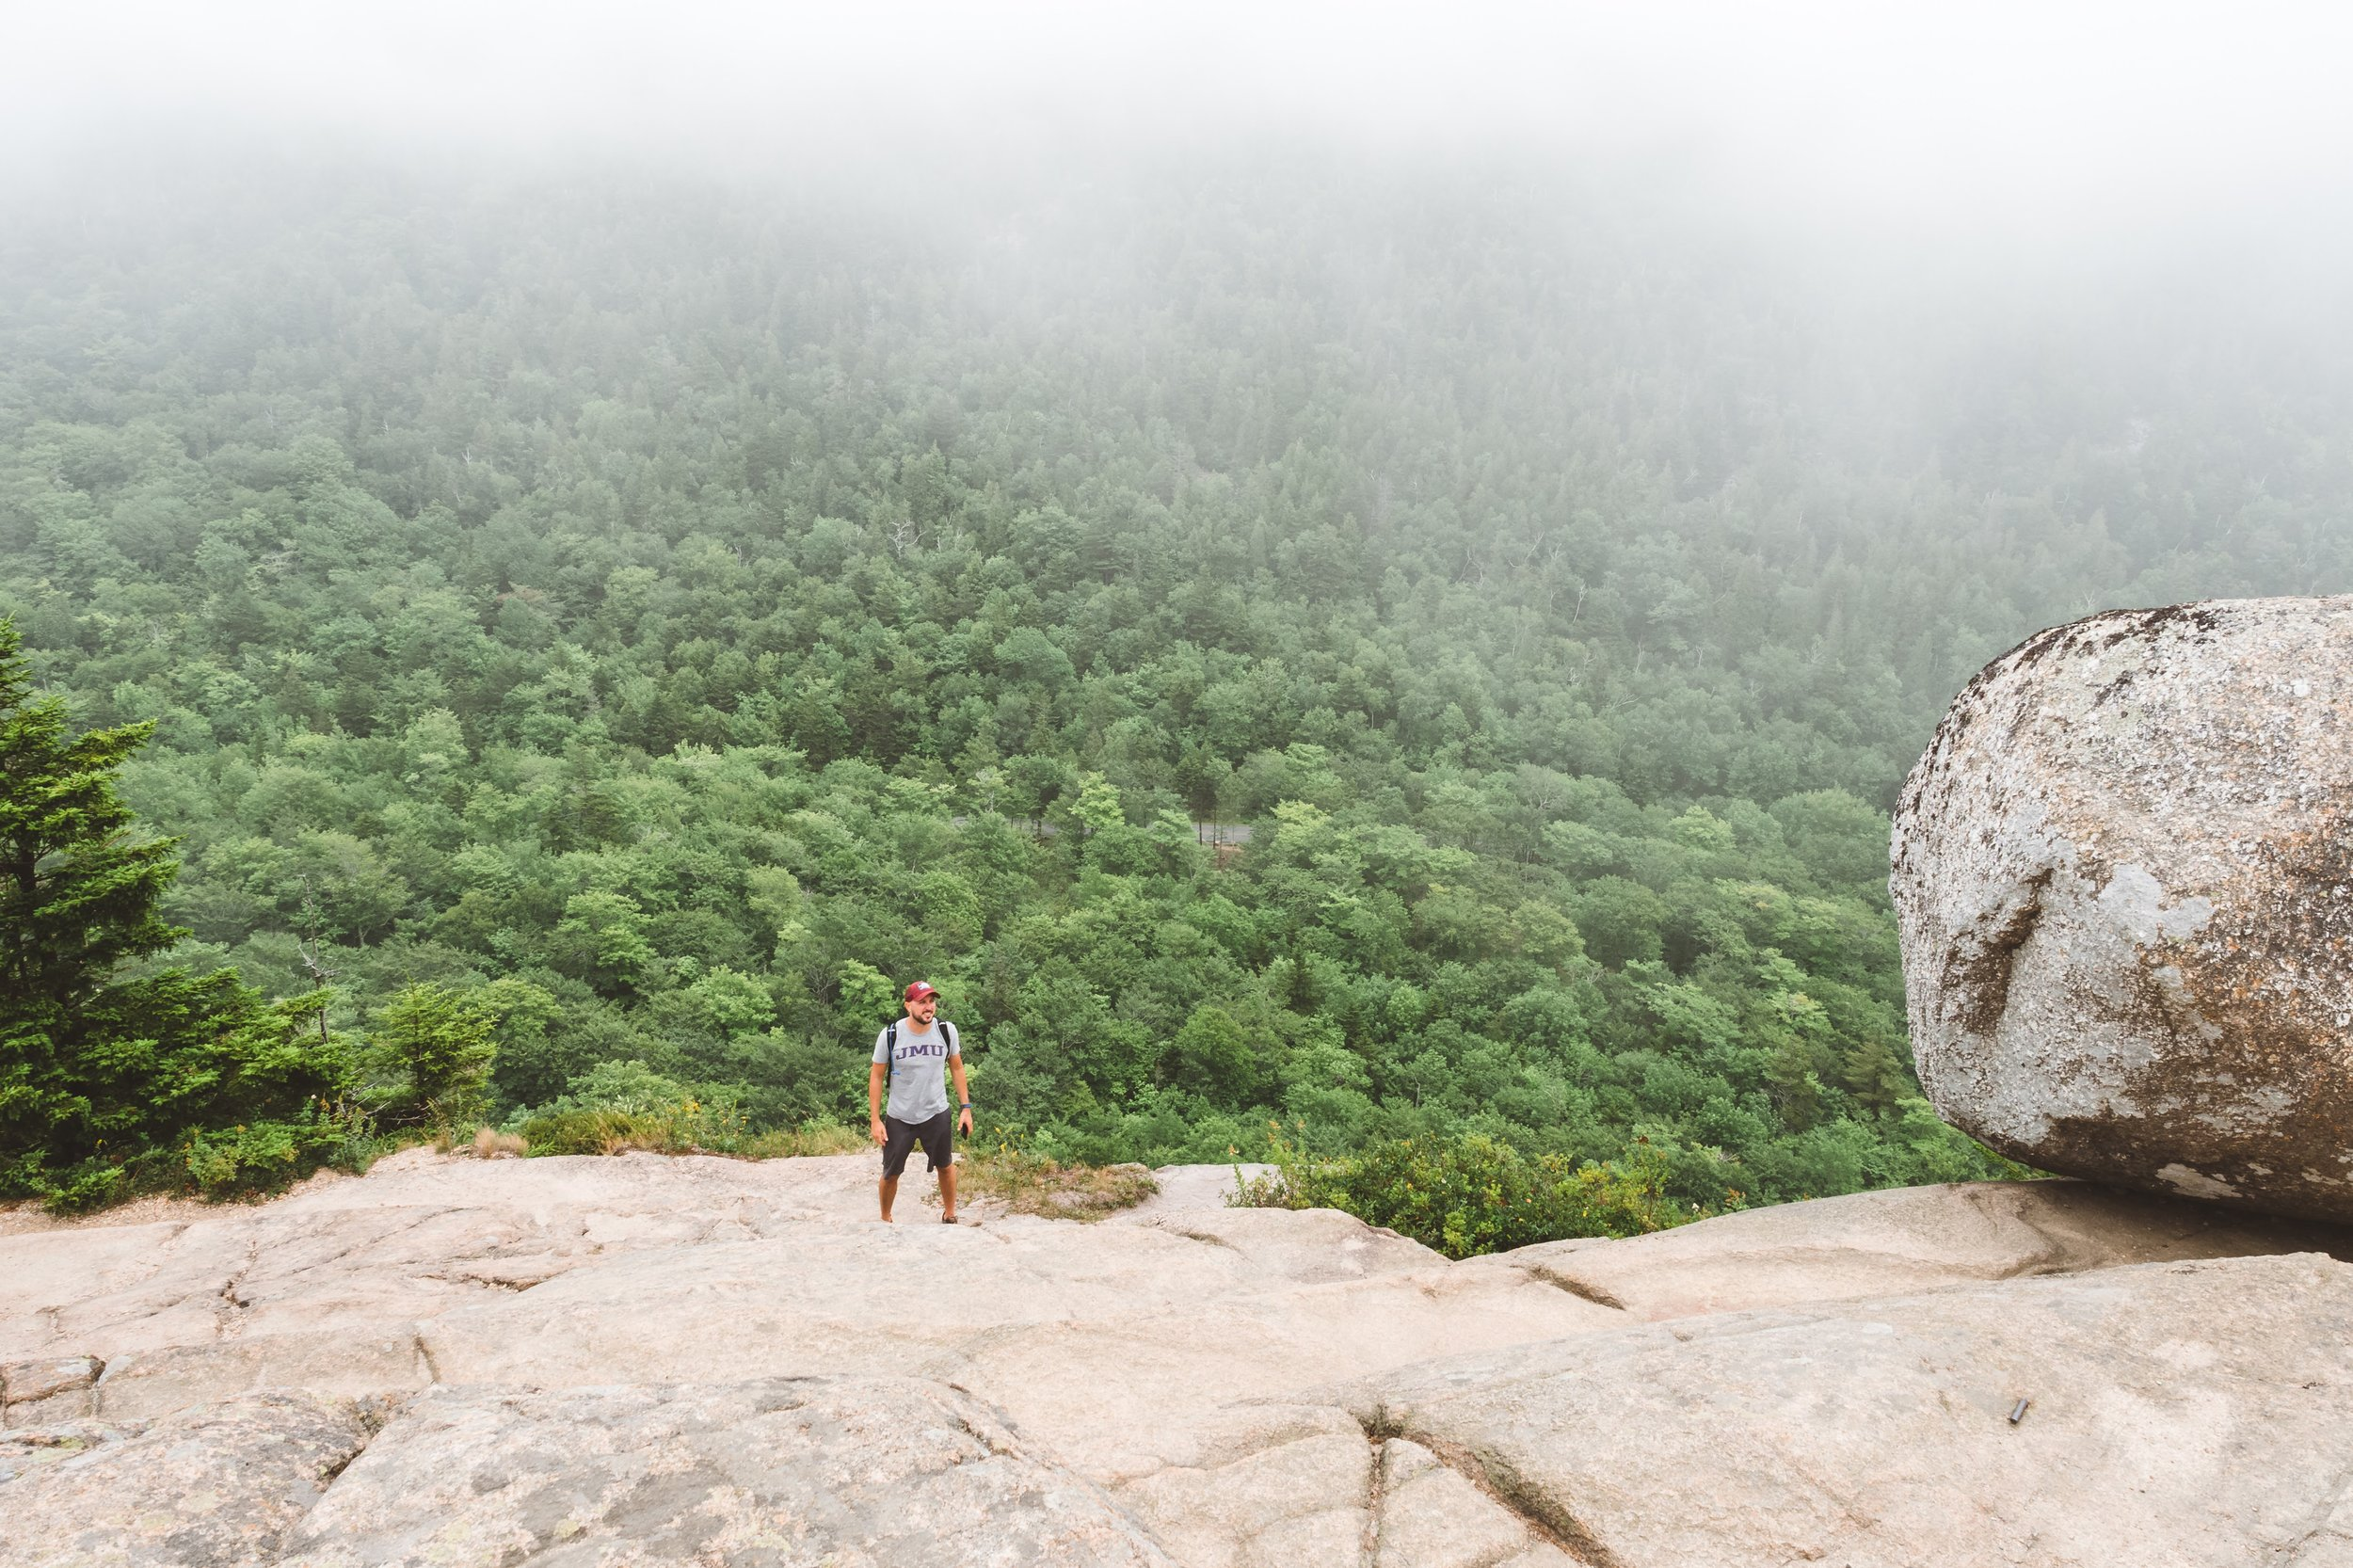 Luis stands near Bubble Rock.